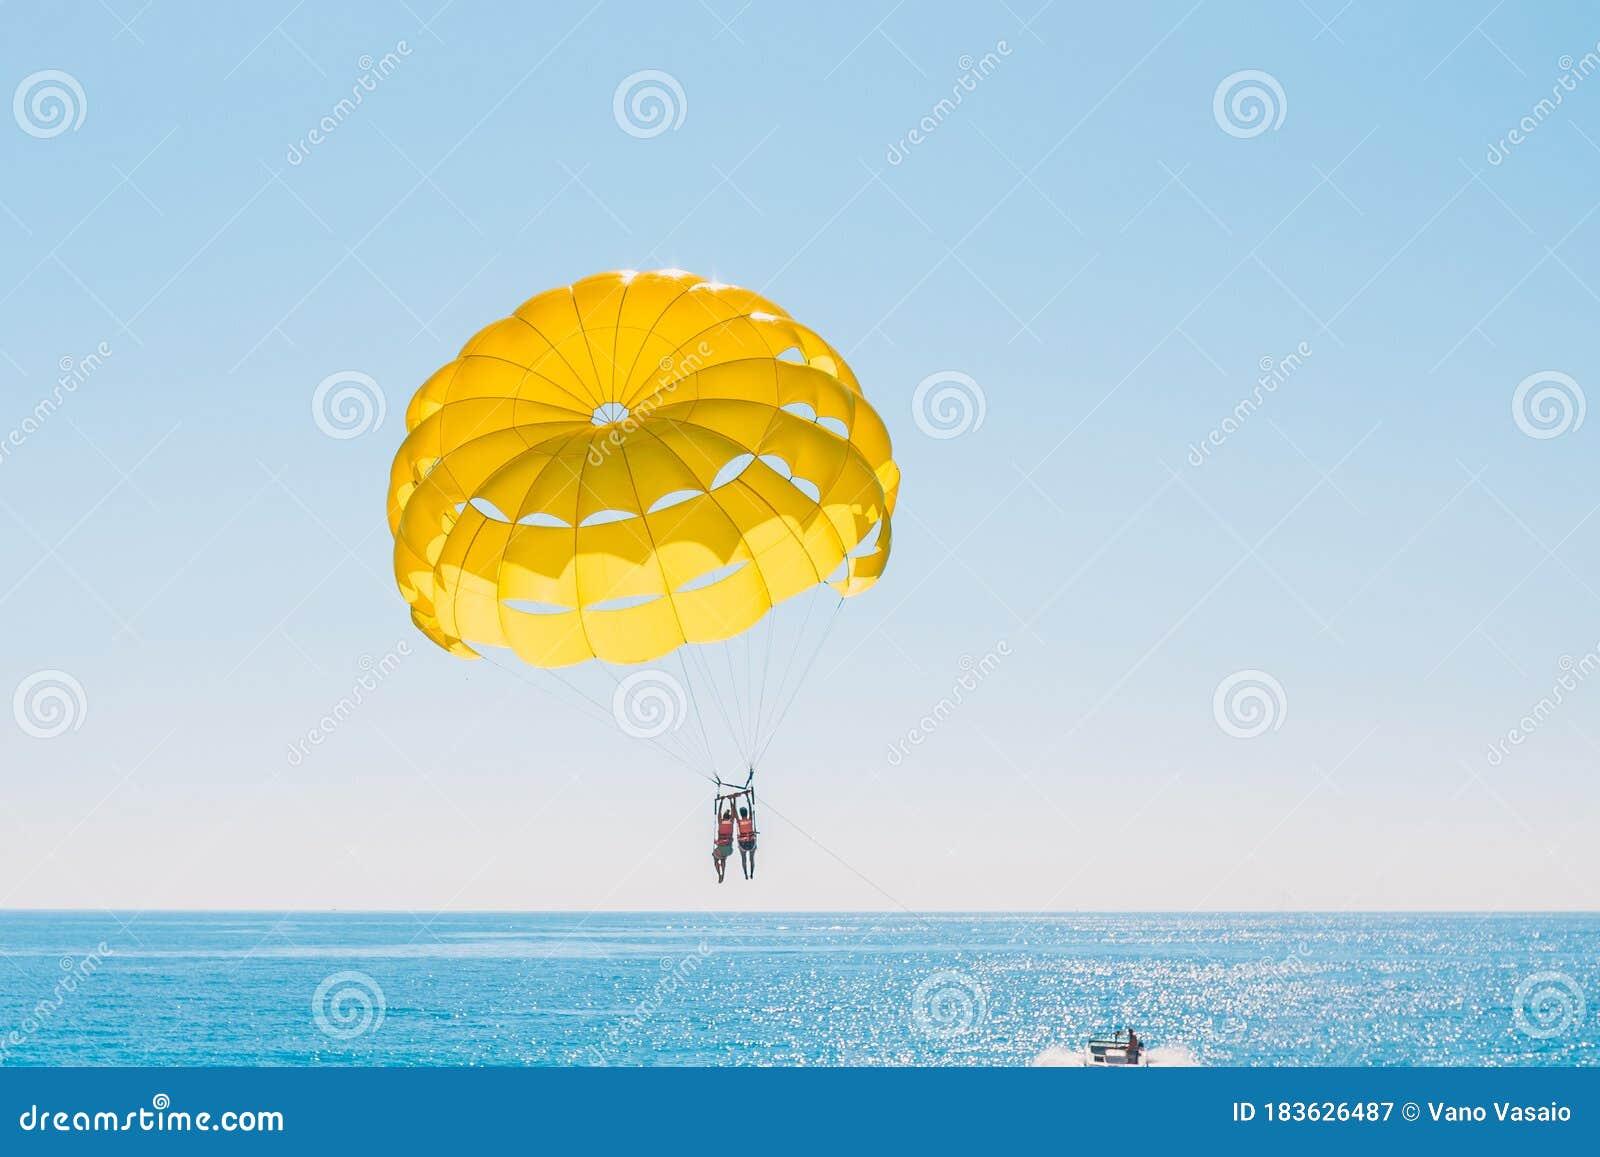 Parasailing Parachute stock photo. Image of float, jumping